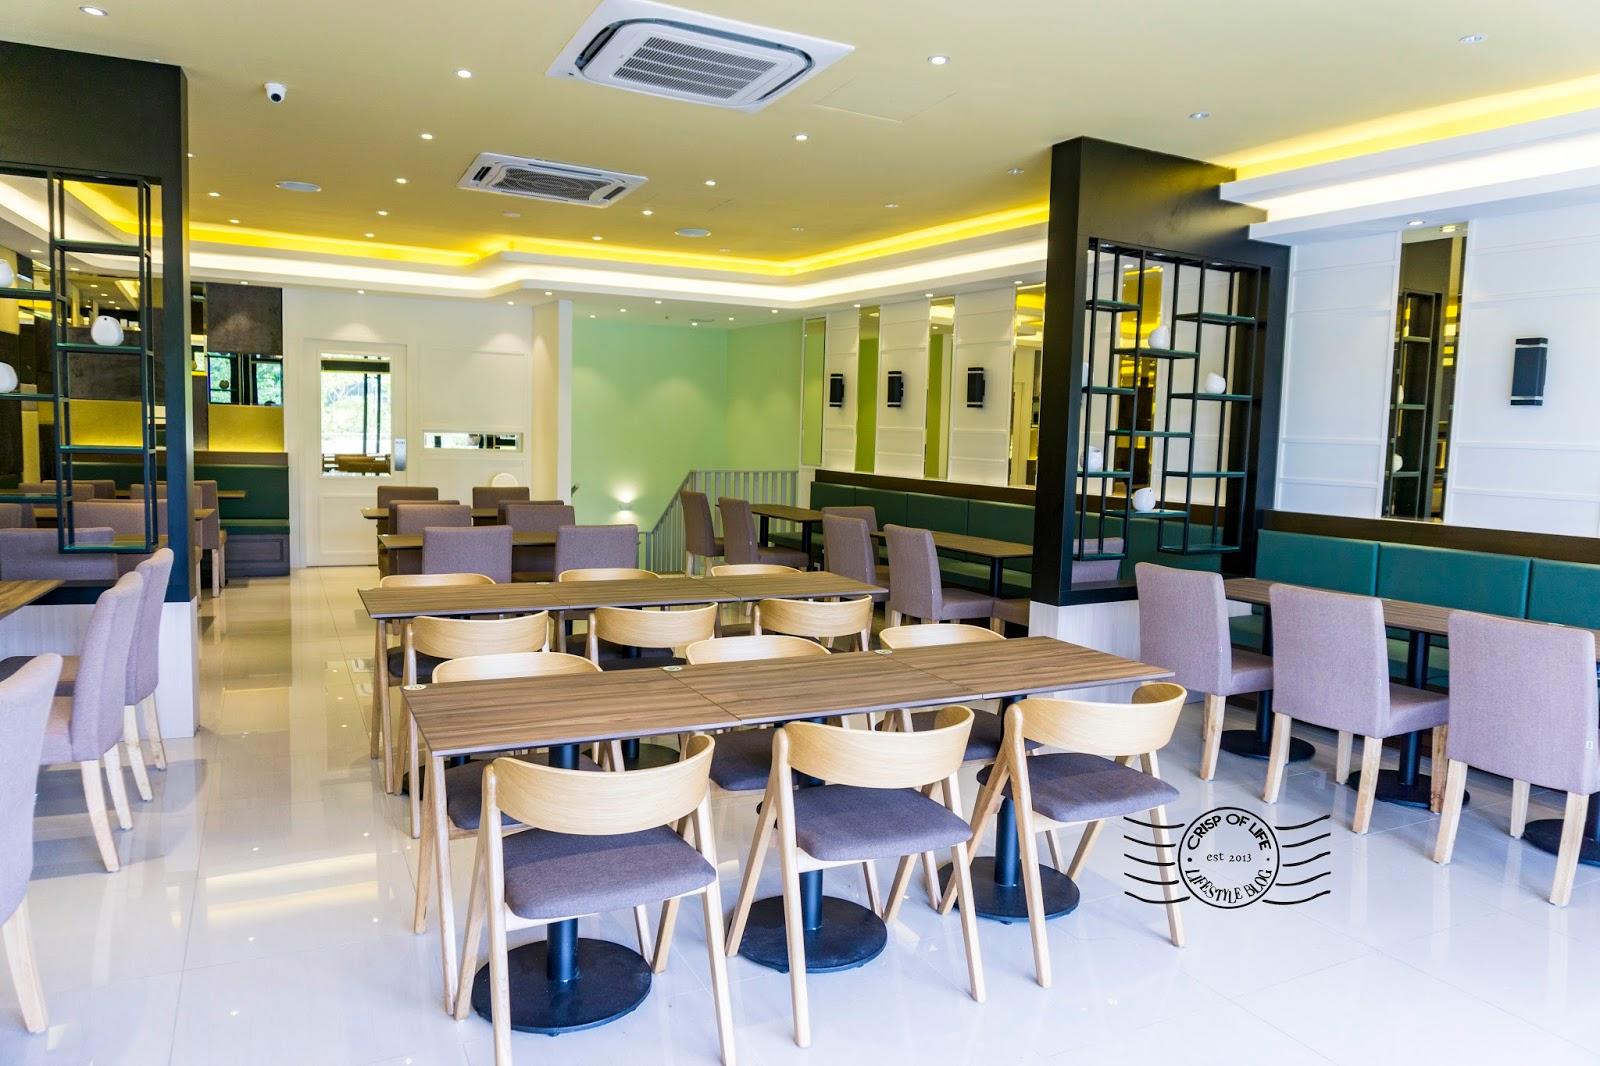 Dandy Modern Food @ Arena Curve, Bayan Lepas, Penang